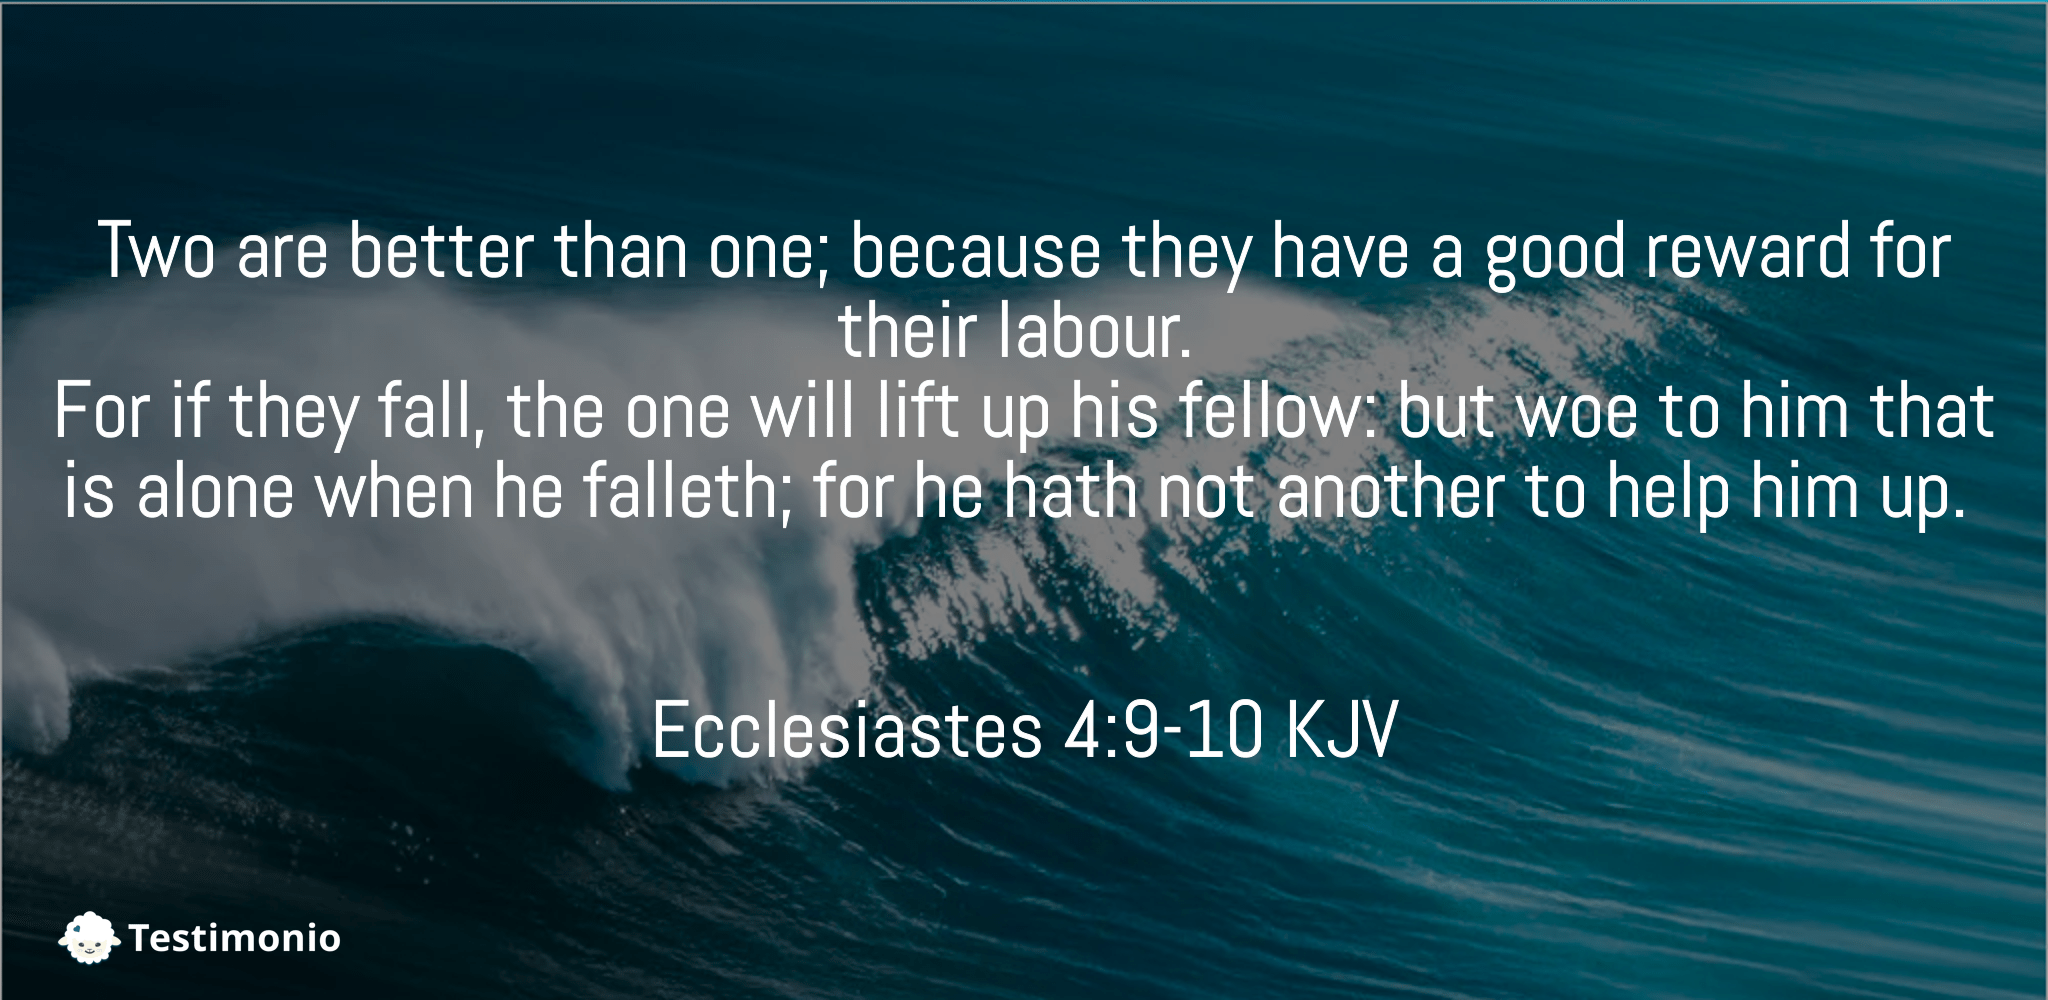 Ecclesiastes 4:9-10